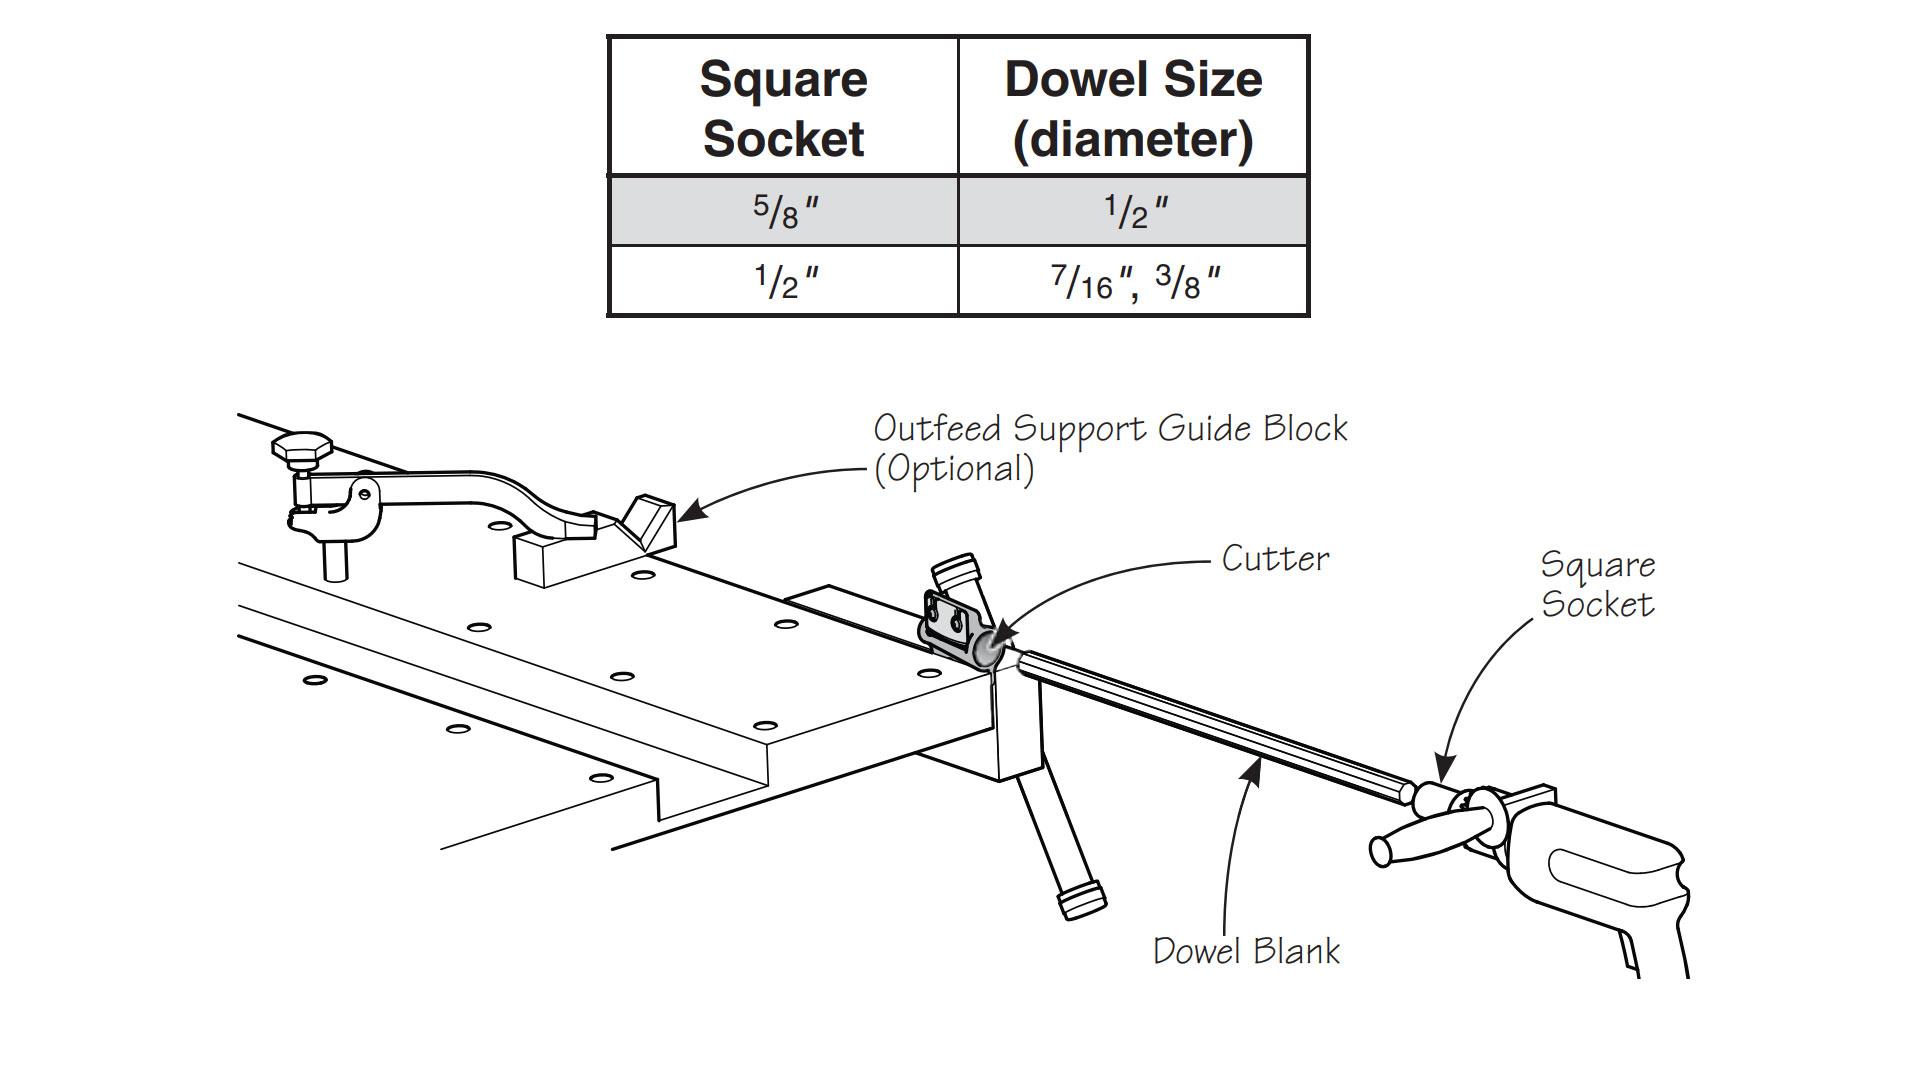 Woodworking Tapered Plug Cutter Dowel Maker 1//2 Inch Shank 18mm Diameter